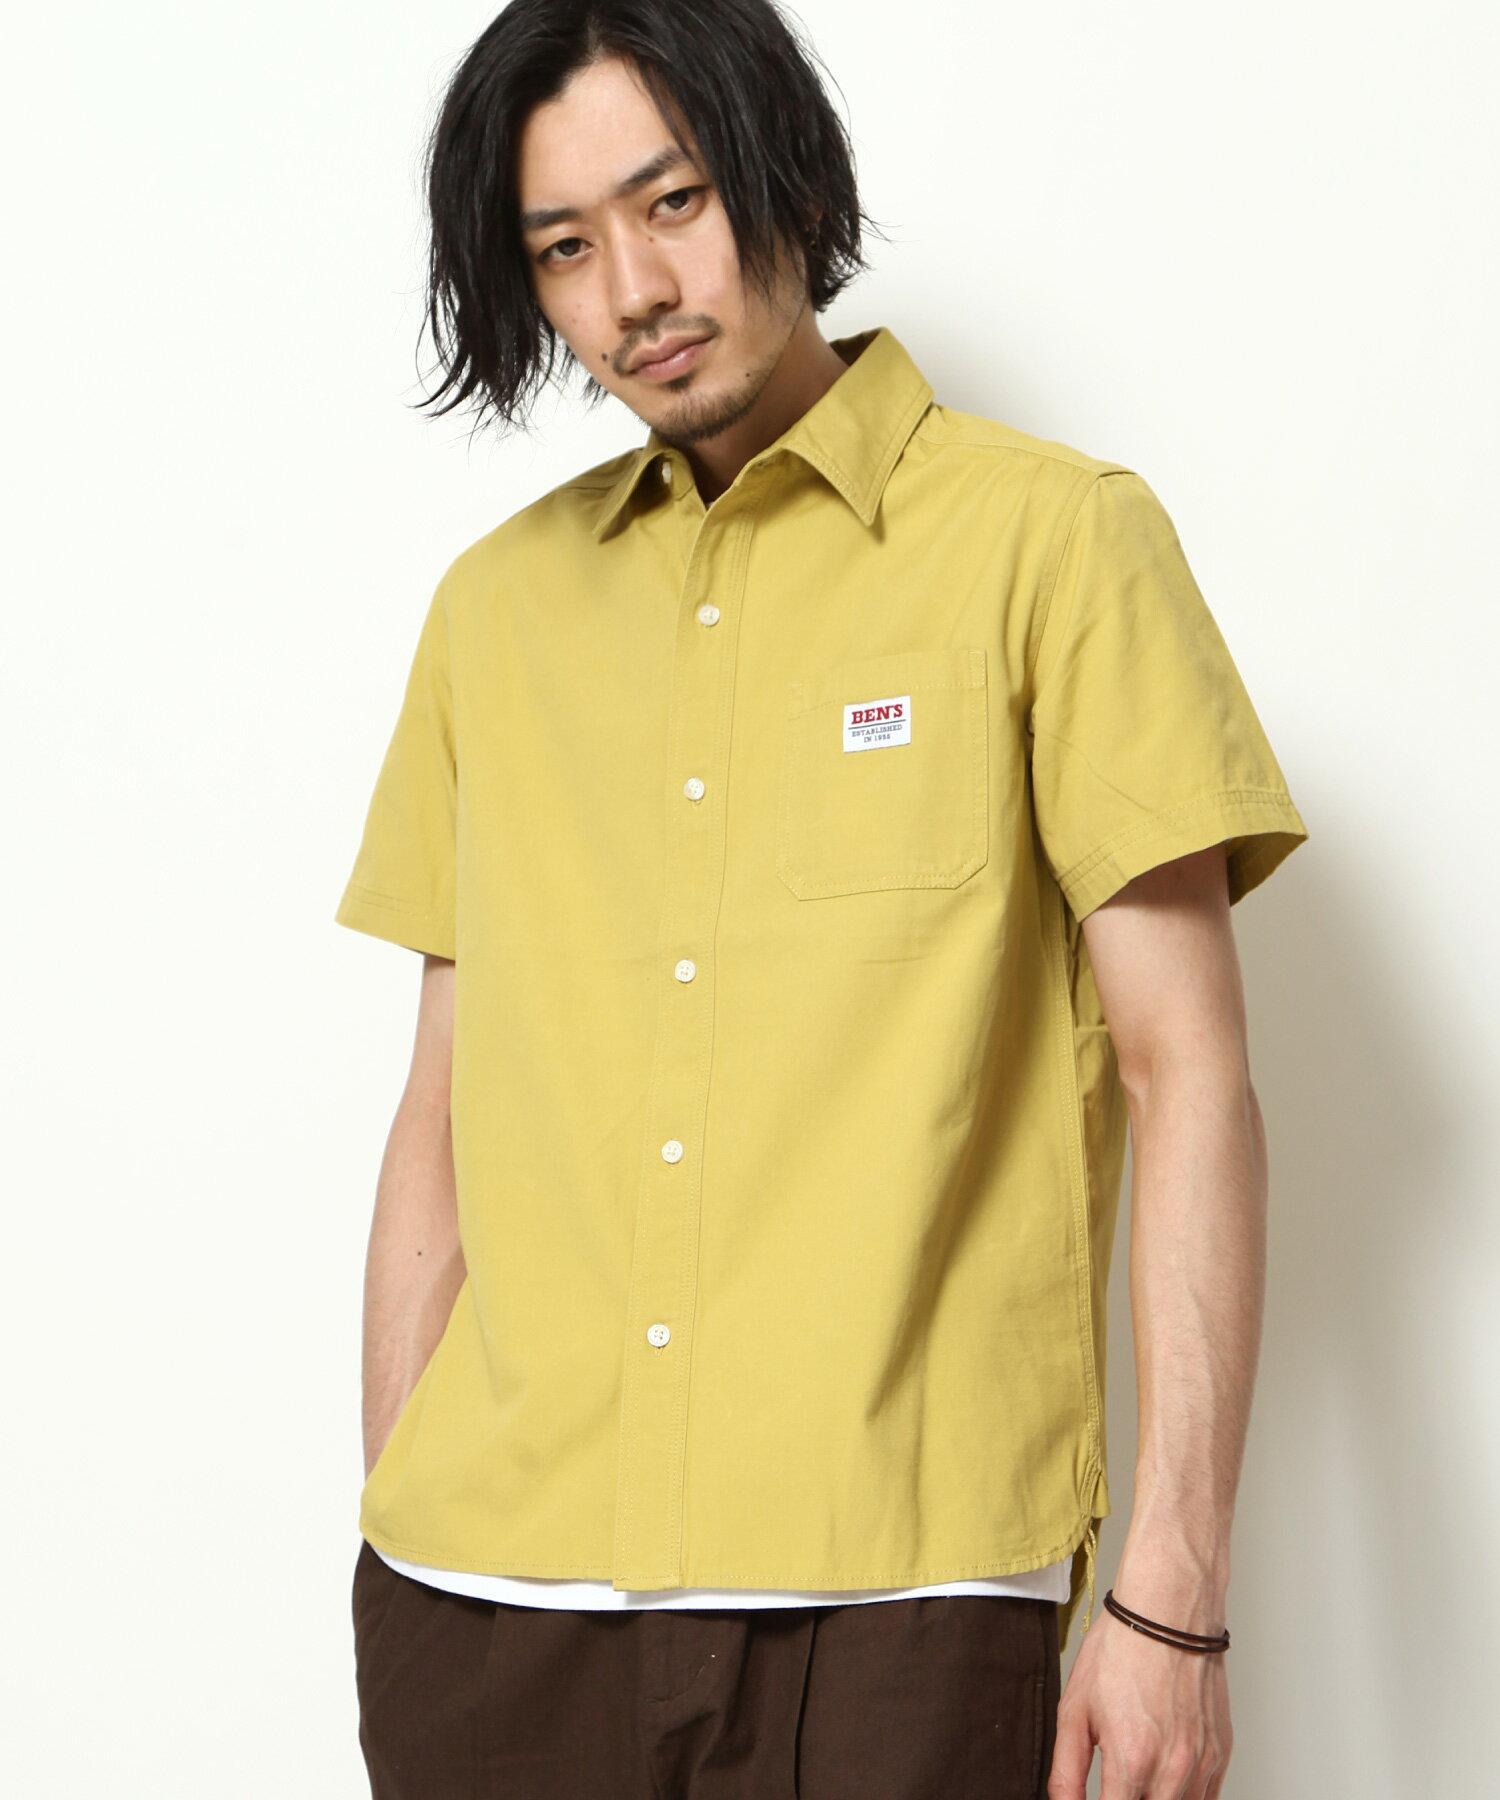 【BEN DAVIS】LOGO名牌刺繡工裝襯衫 短袖 6